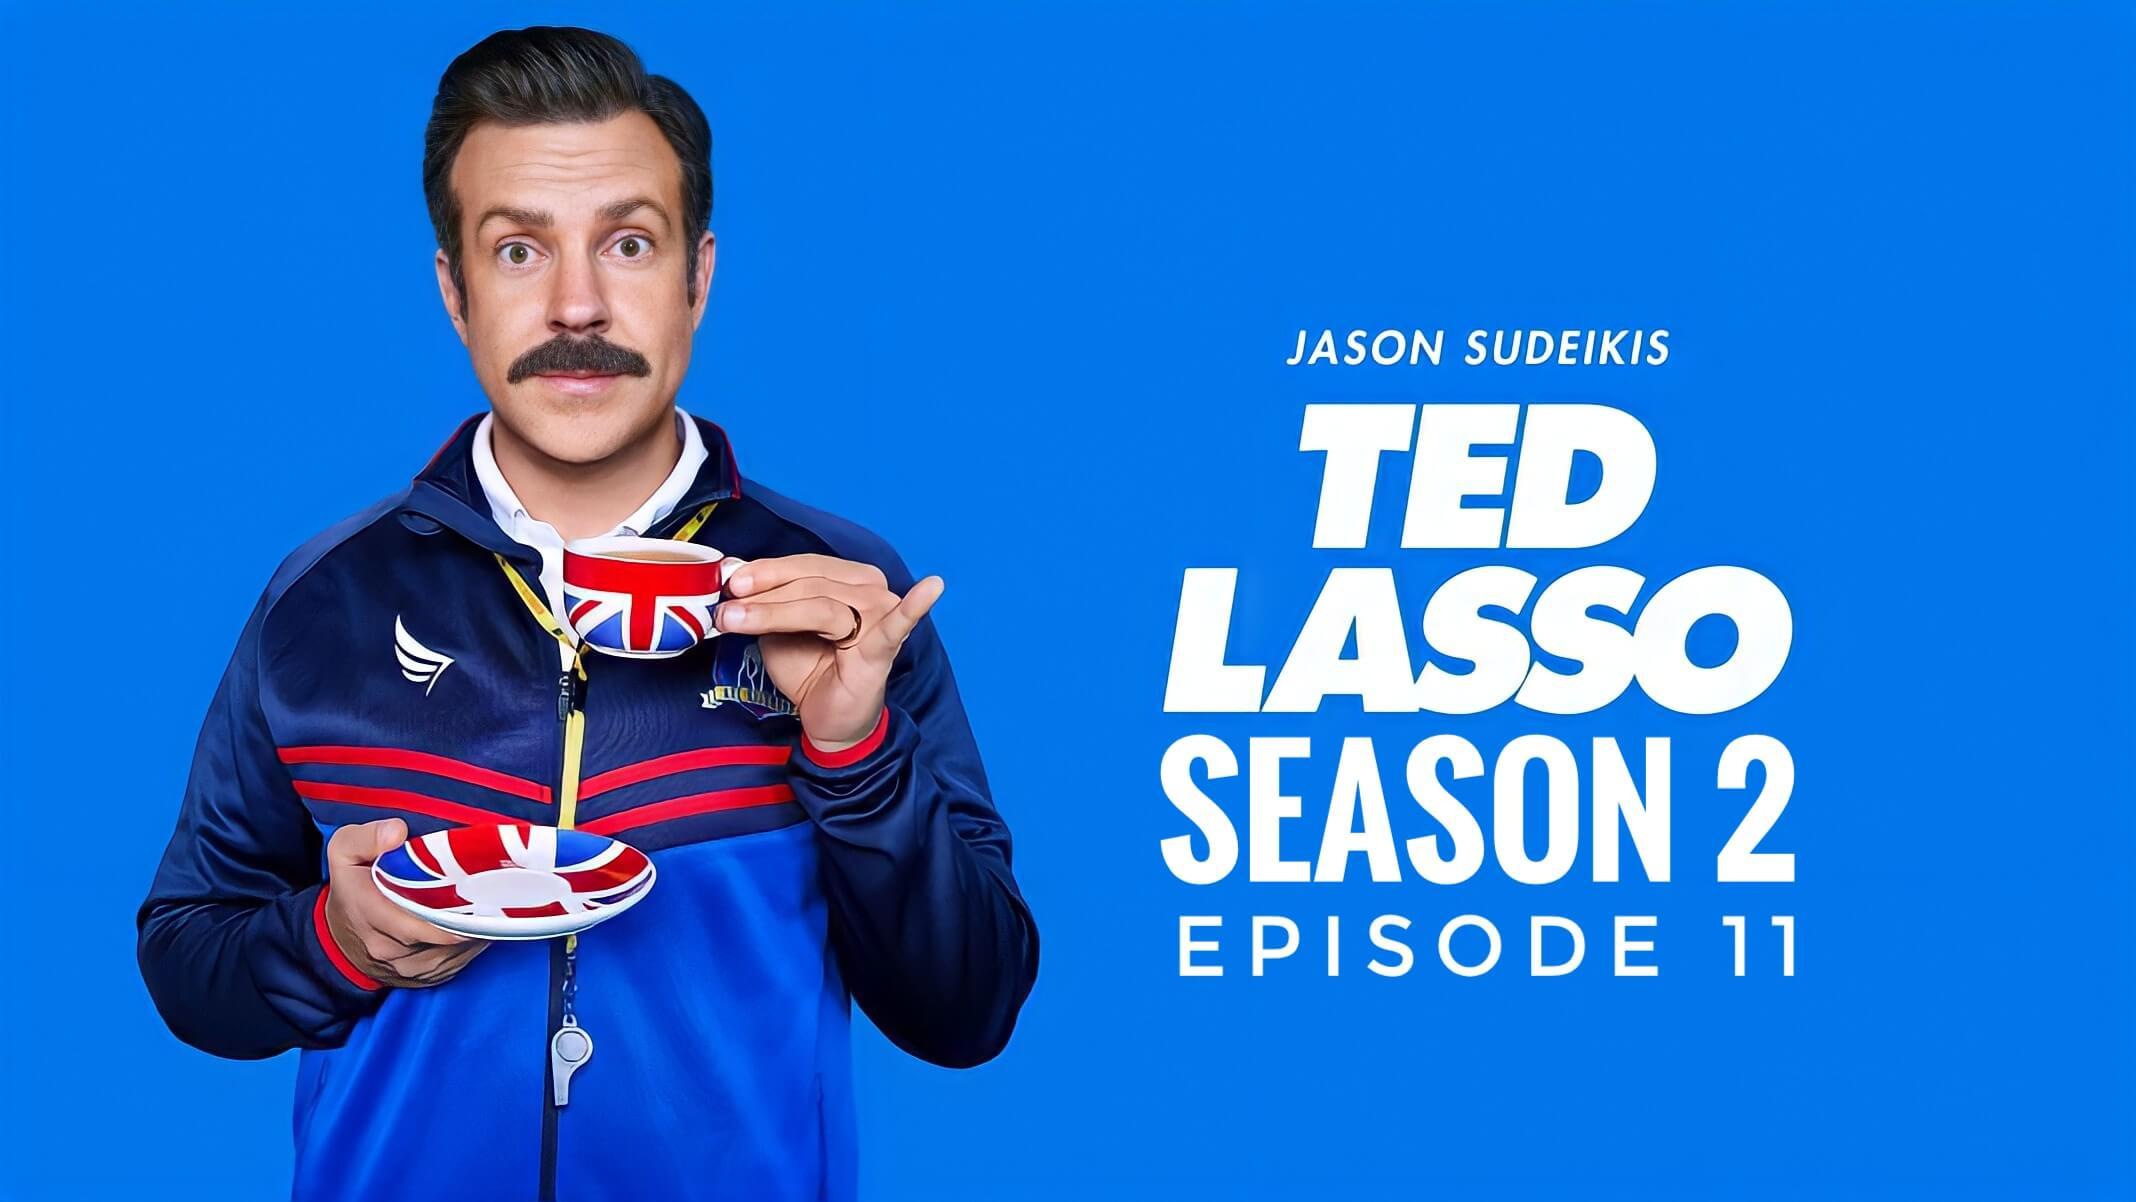 Ted Lasso season 2 episode 11 release date